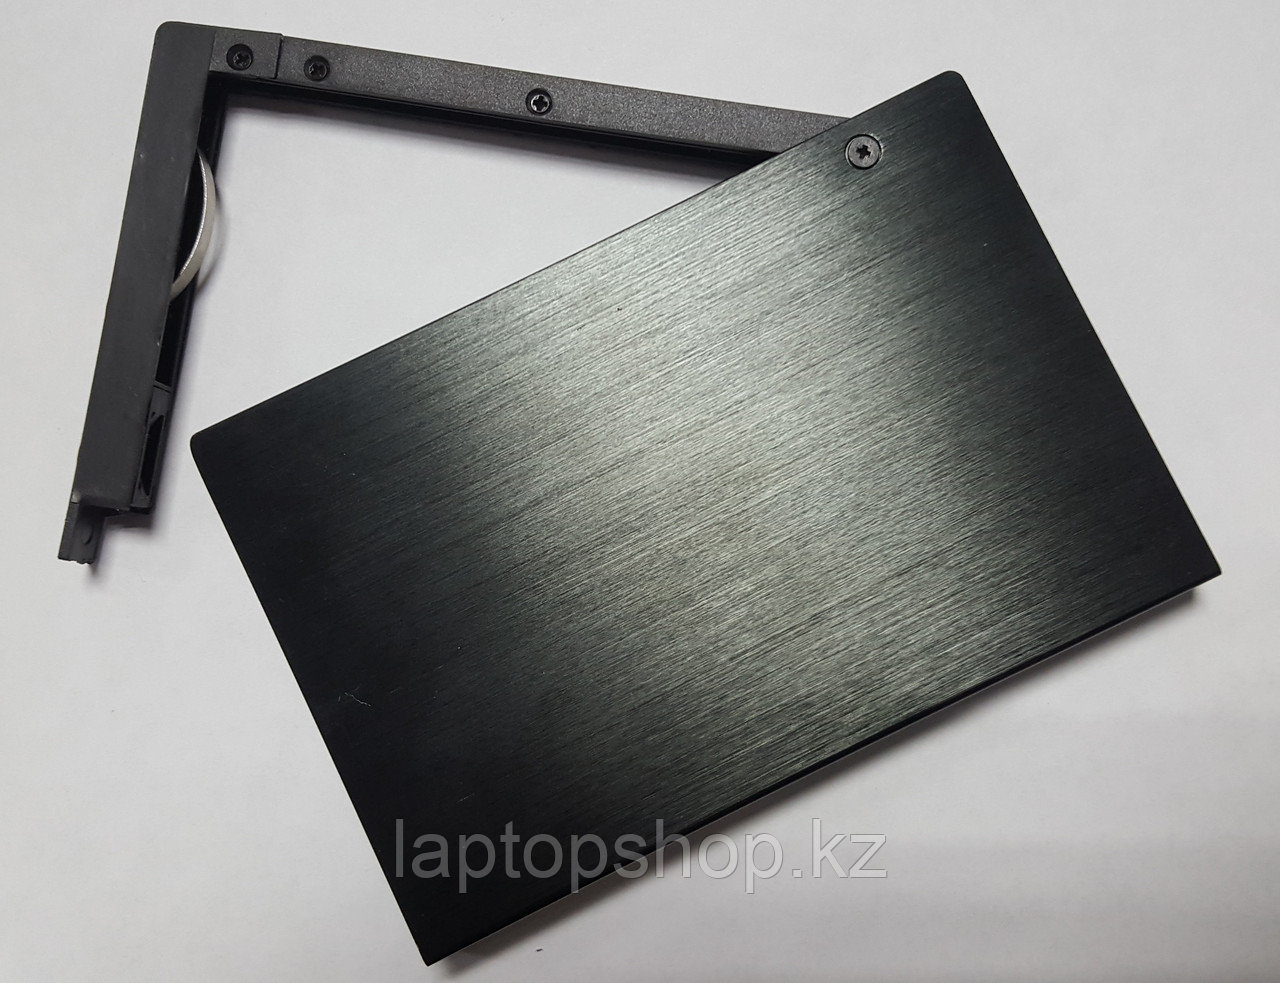 "Внешний корпус Deluxe DMR25-U3B, 2.5"" SATA, USB 3.0"